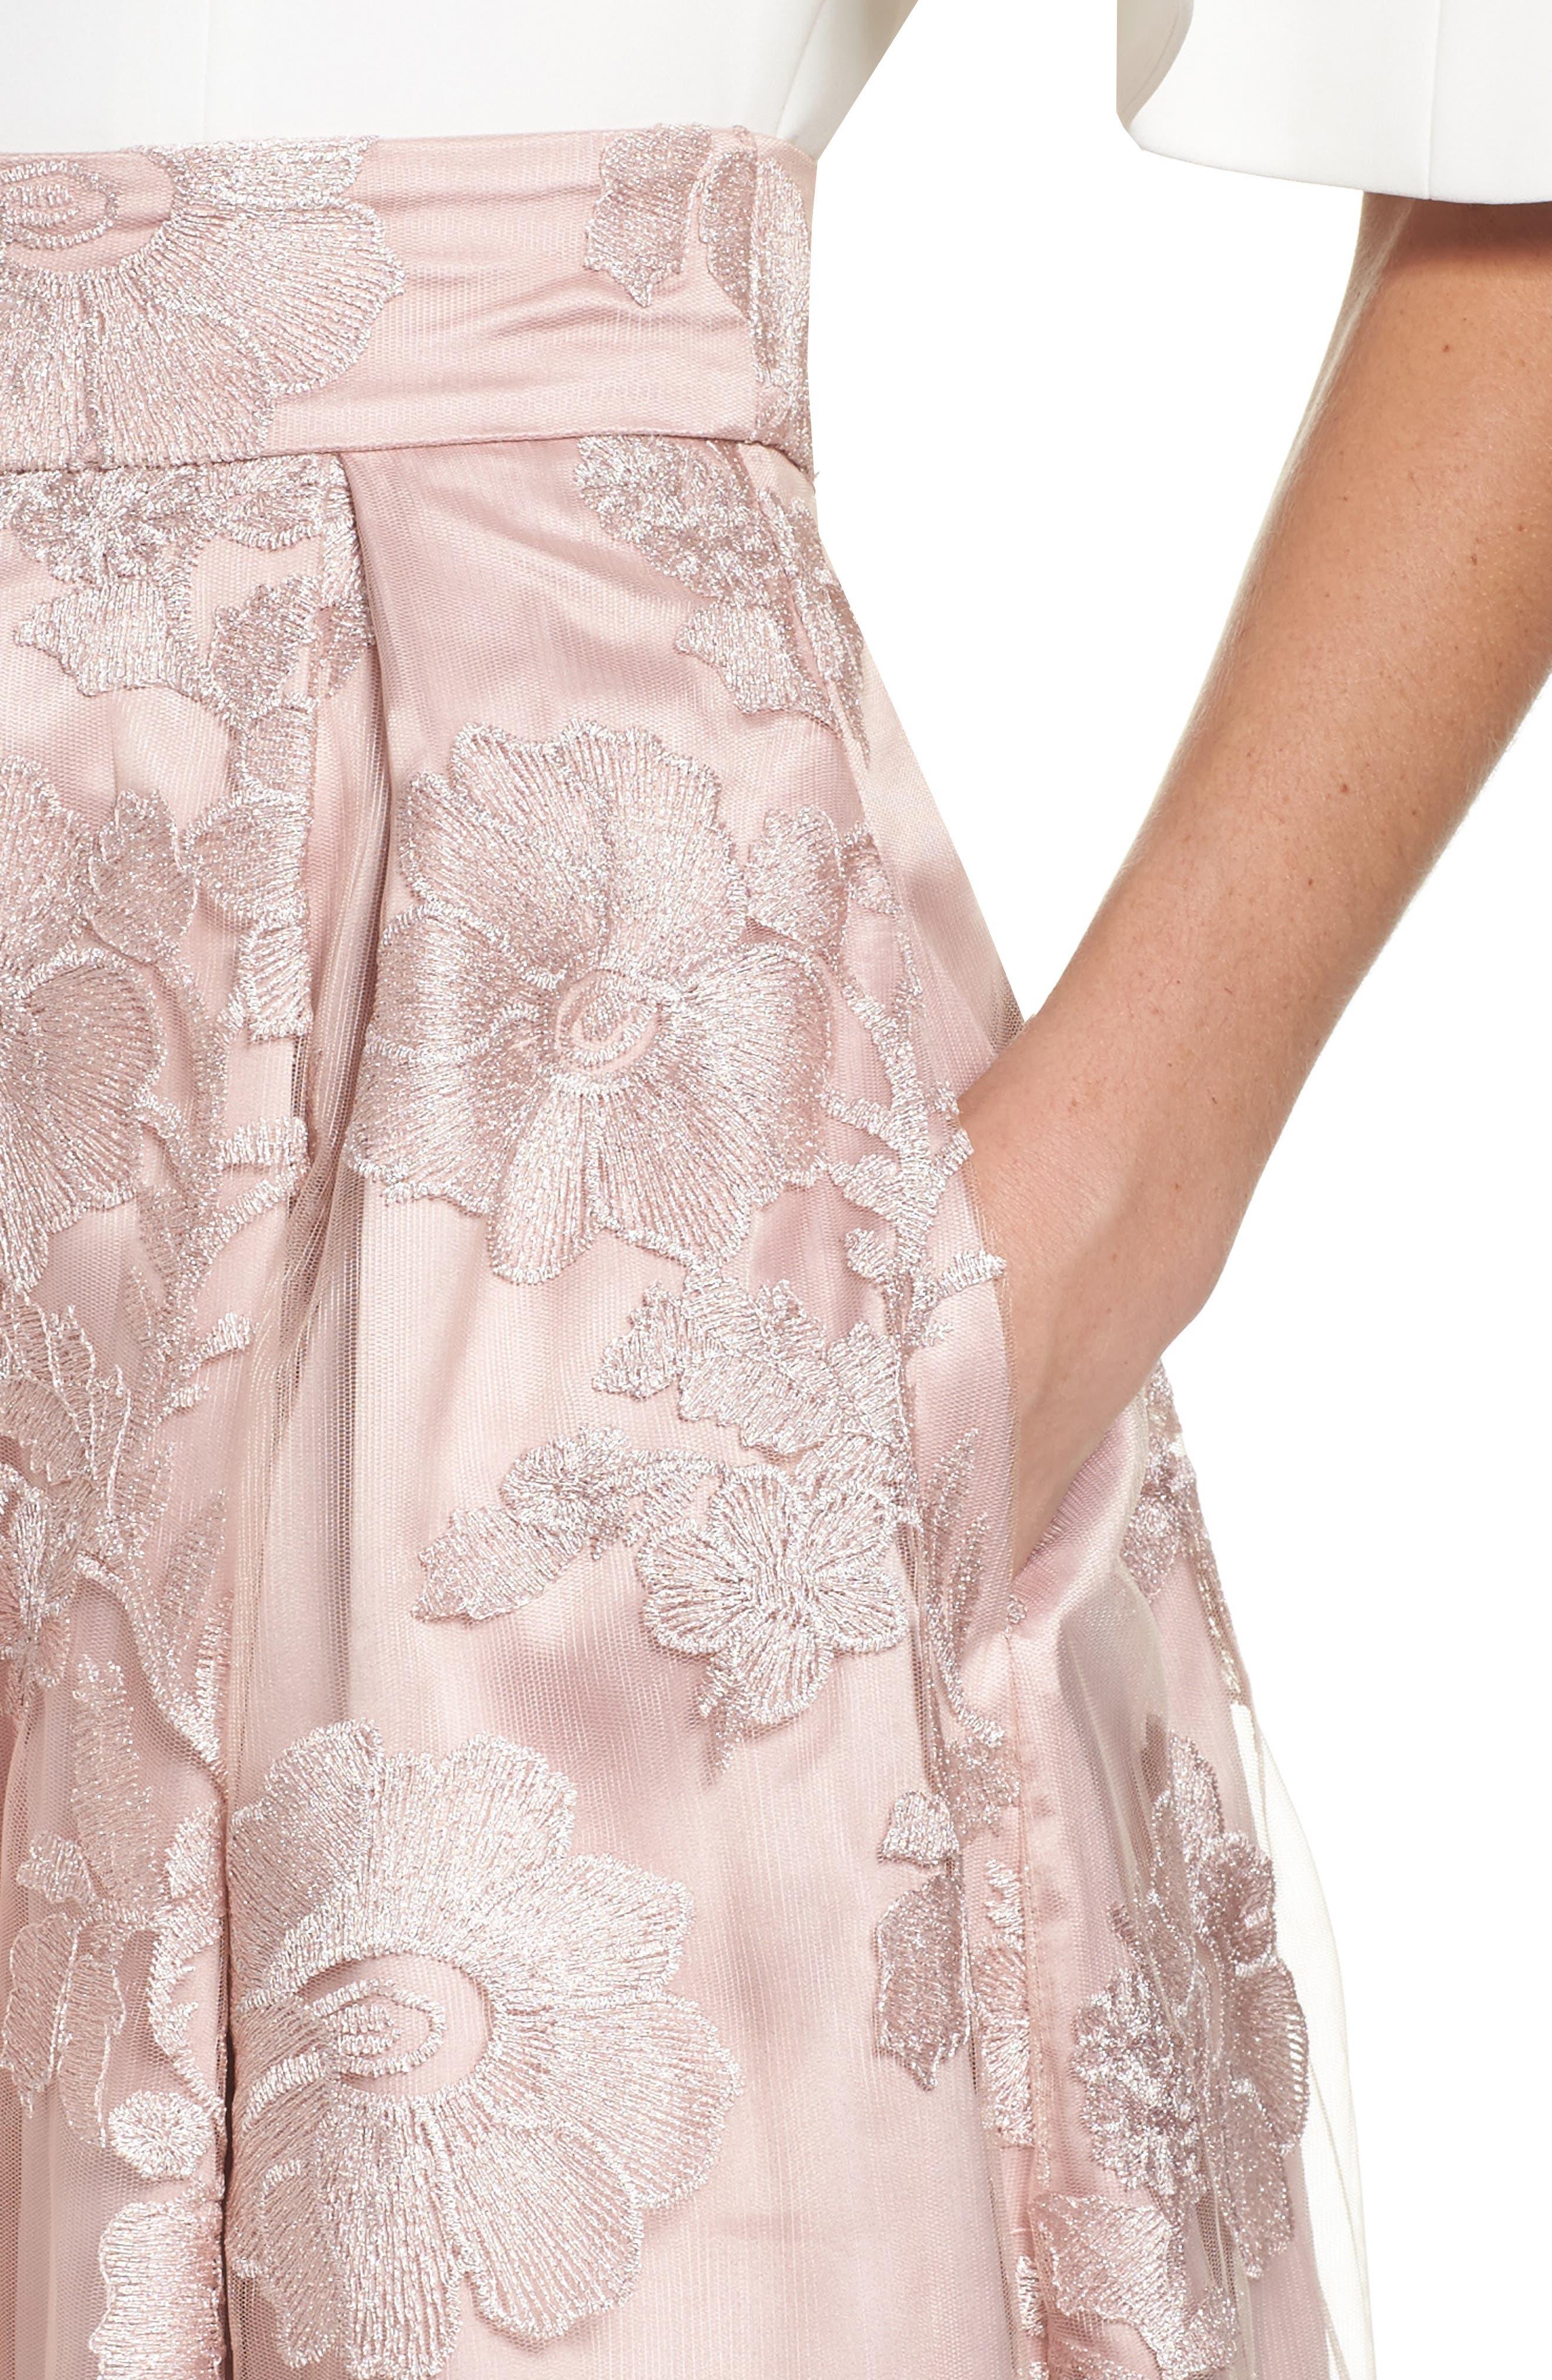 ELIZA J, Floral Embroidered Skirt, Alternate thumbnail 4, color, 254